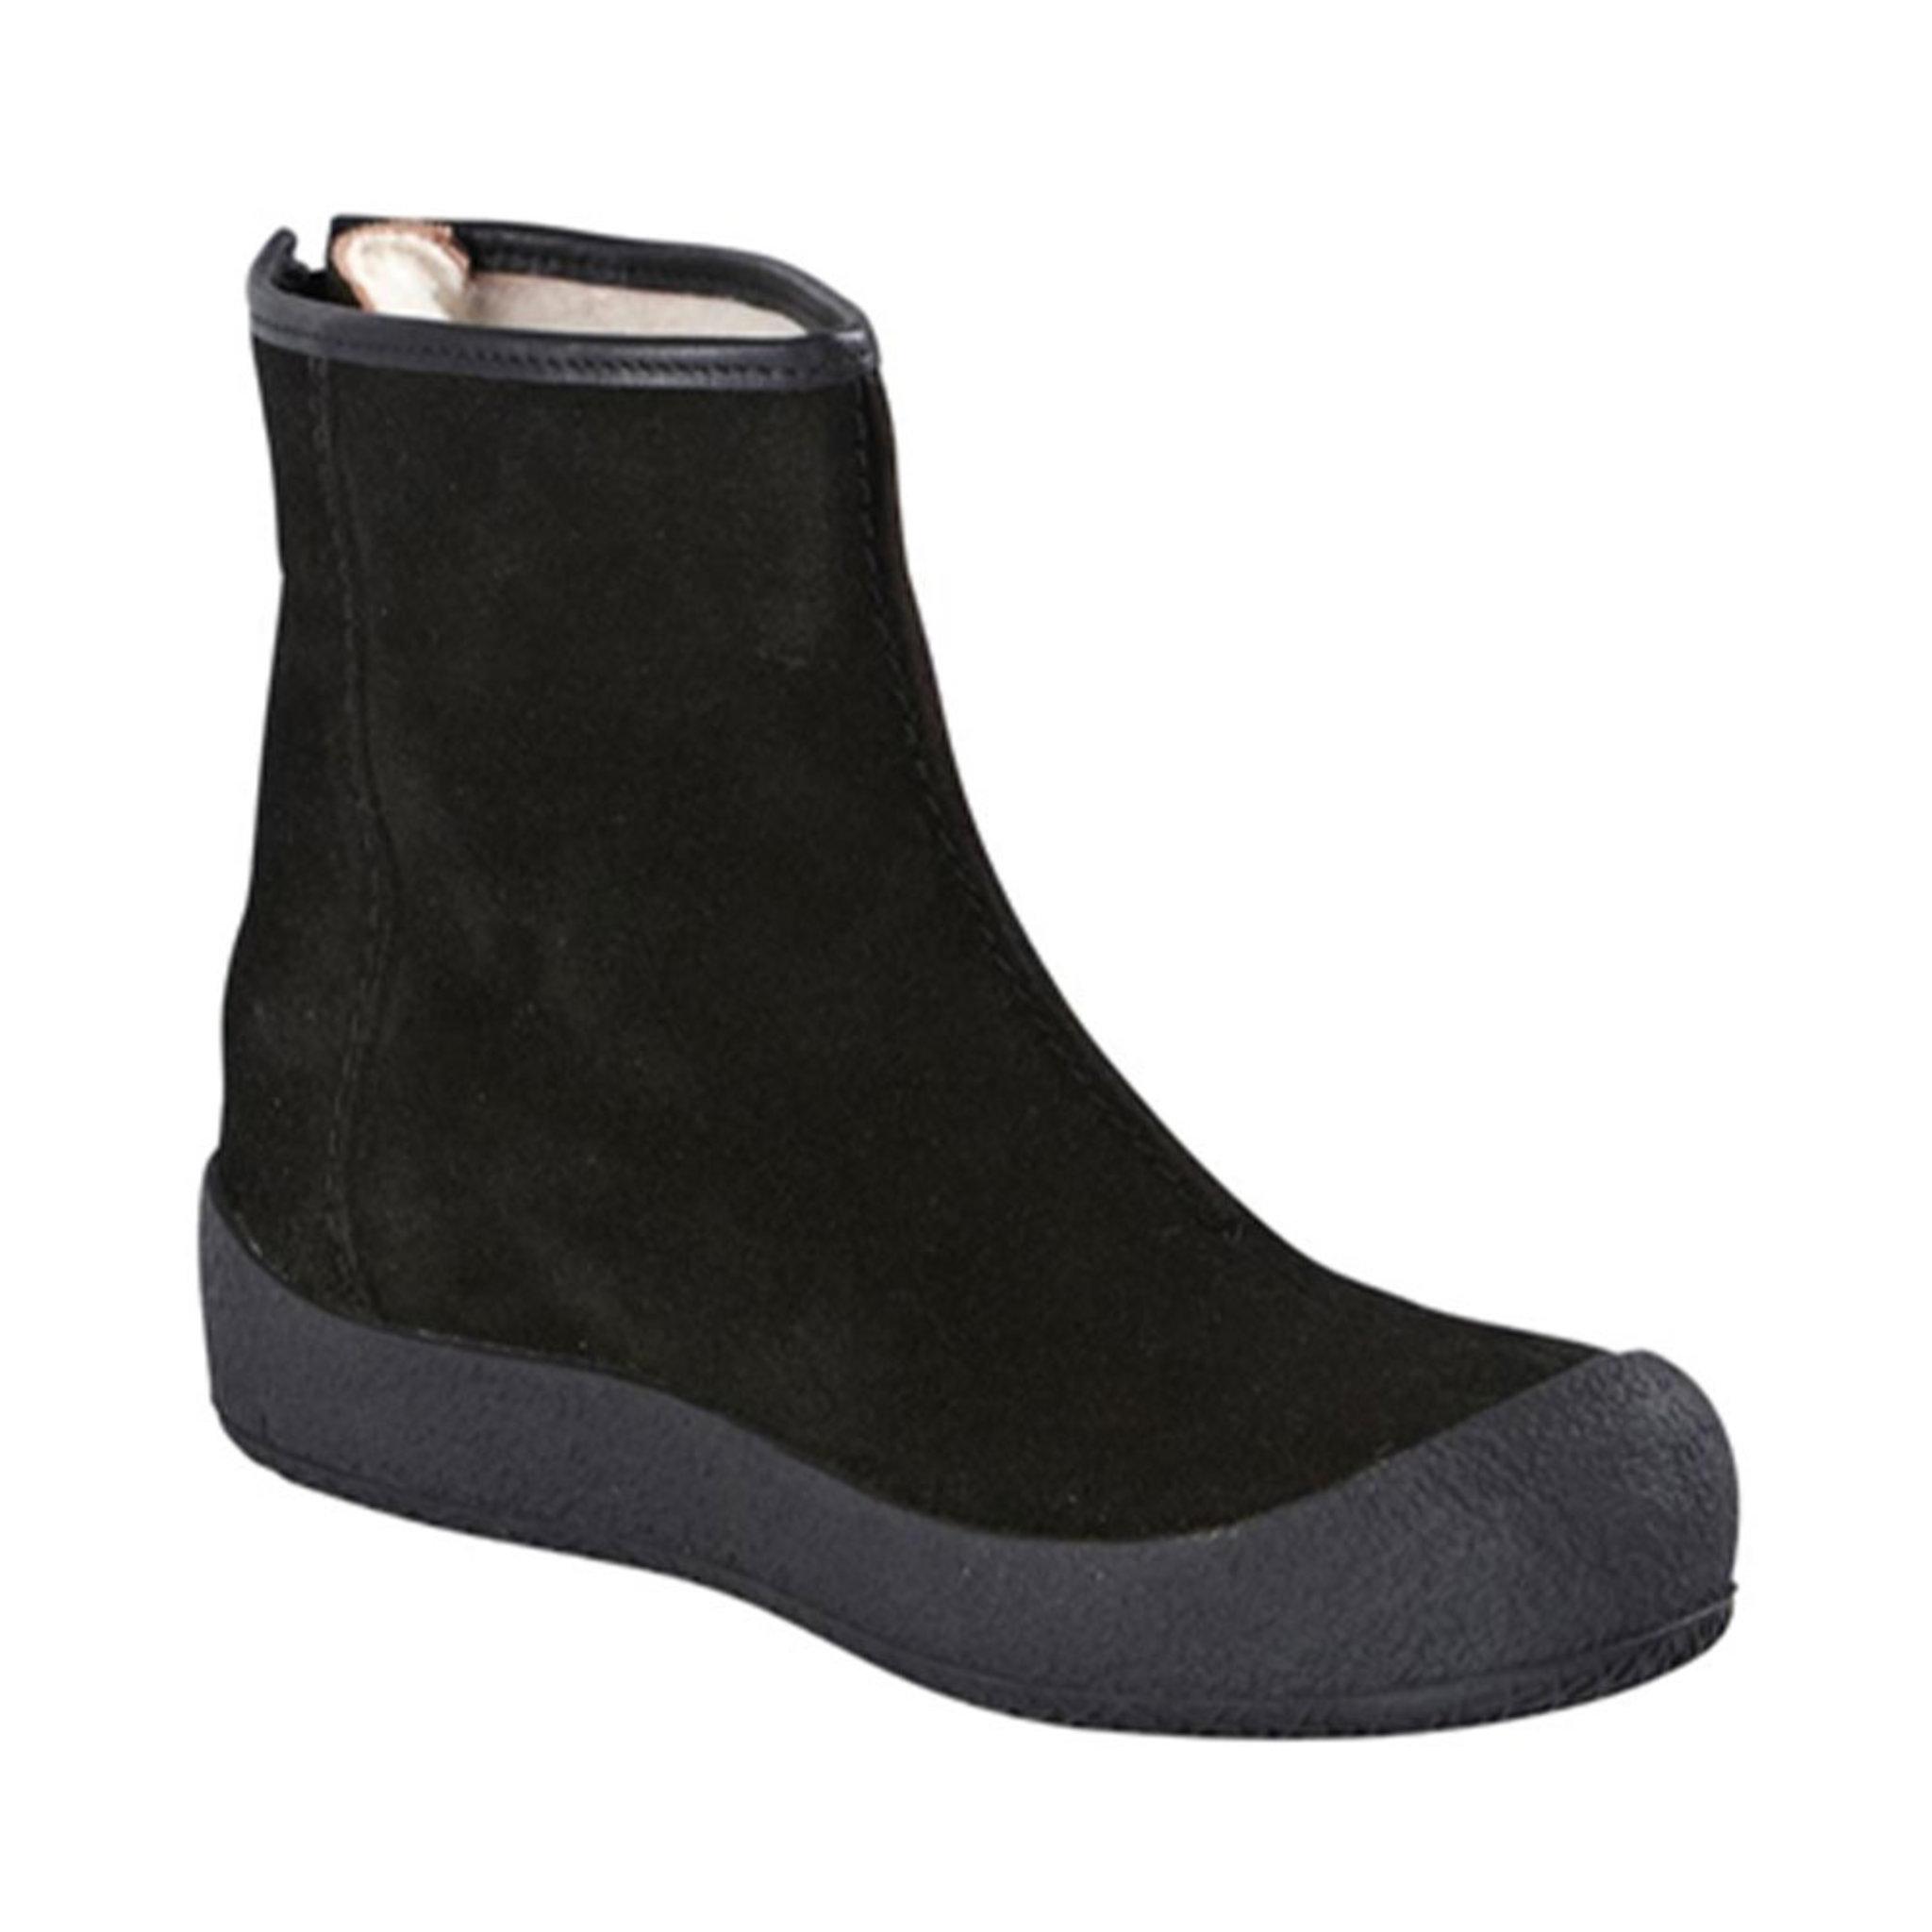 Boots Elin, svart